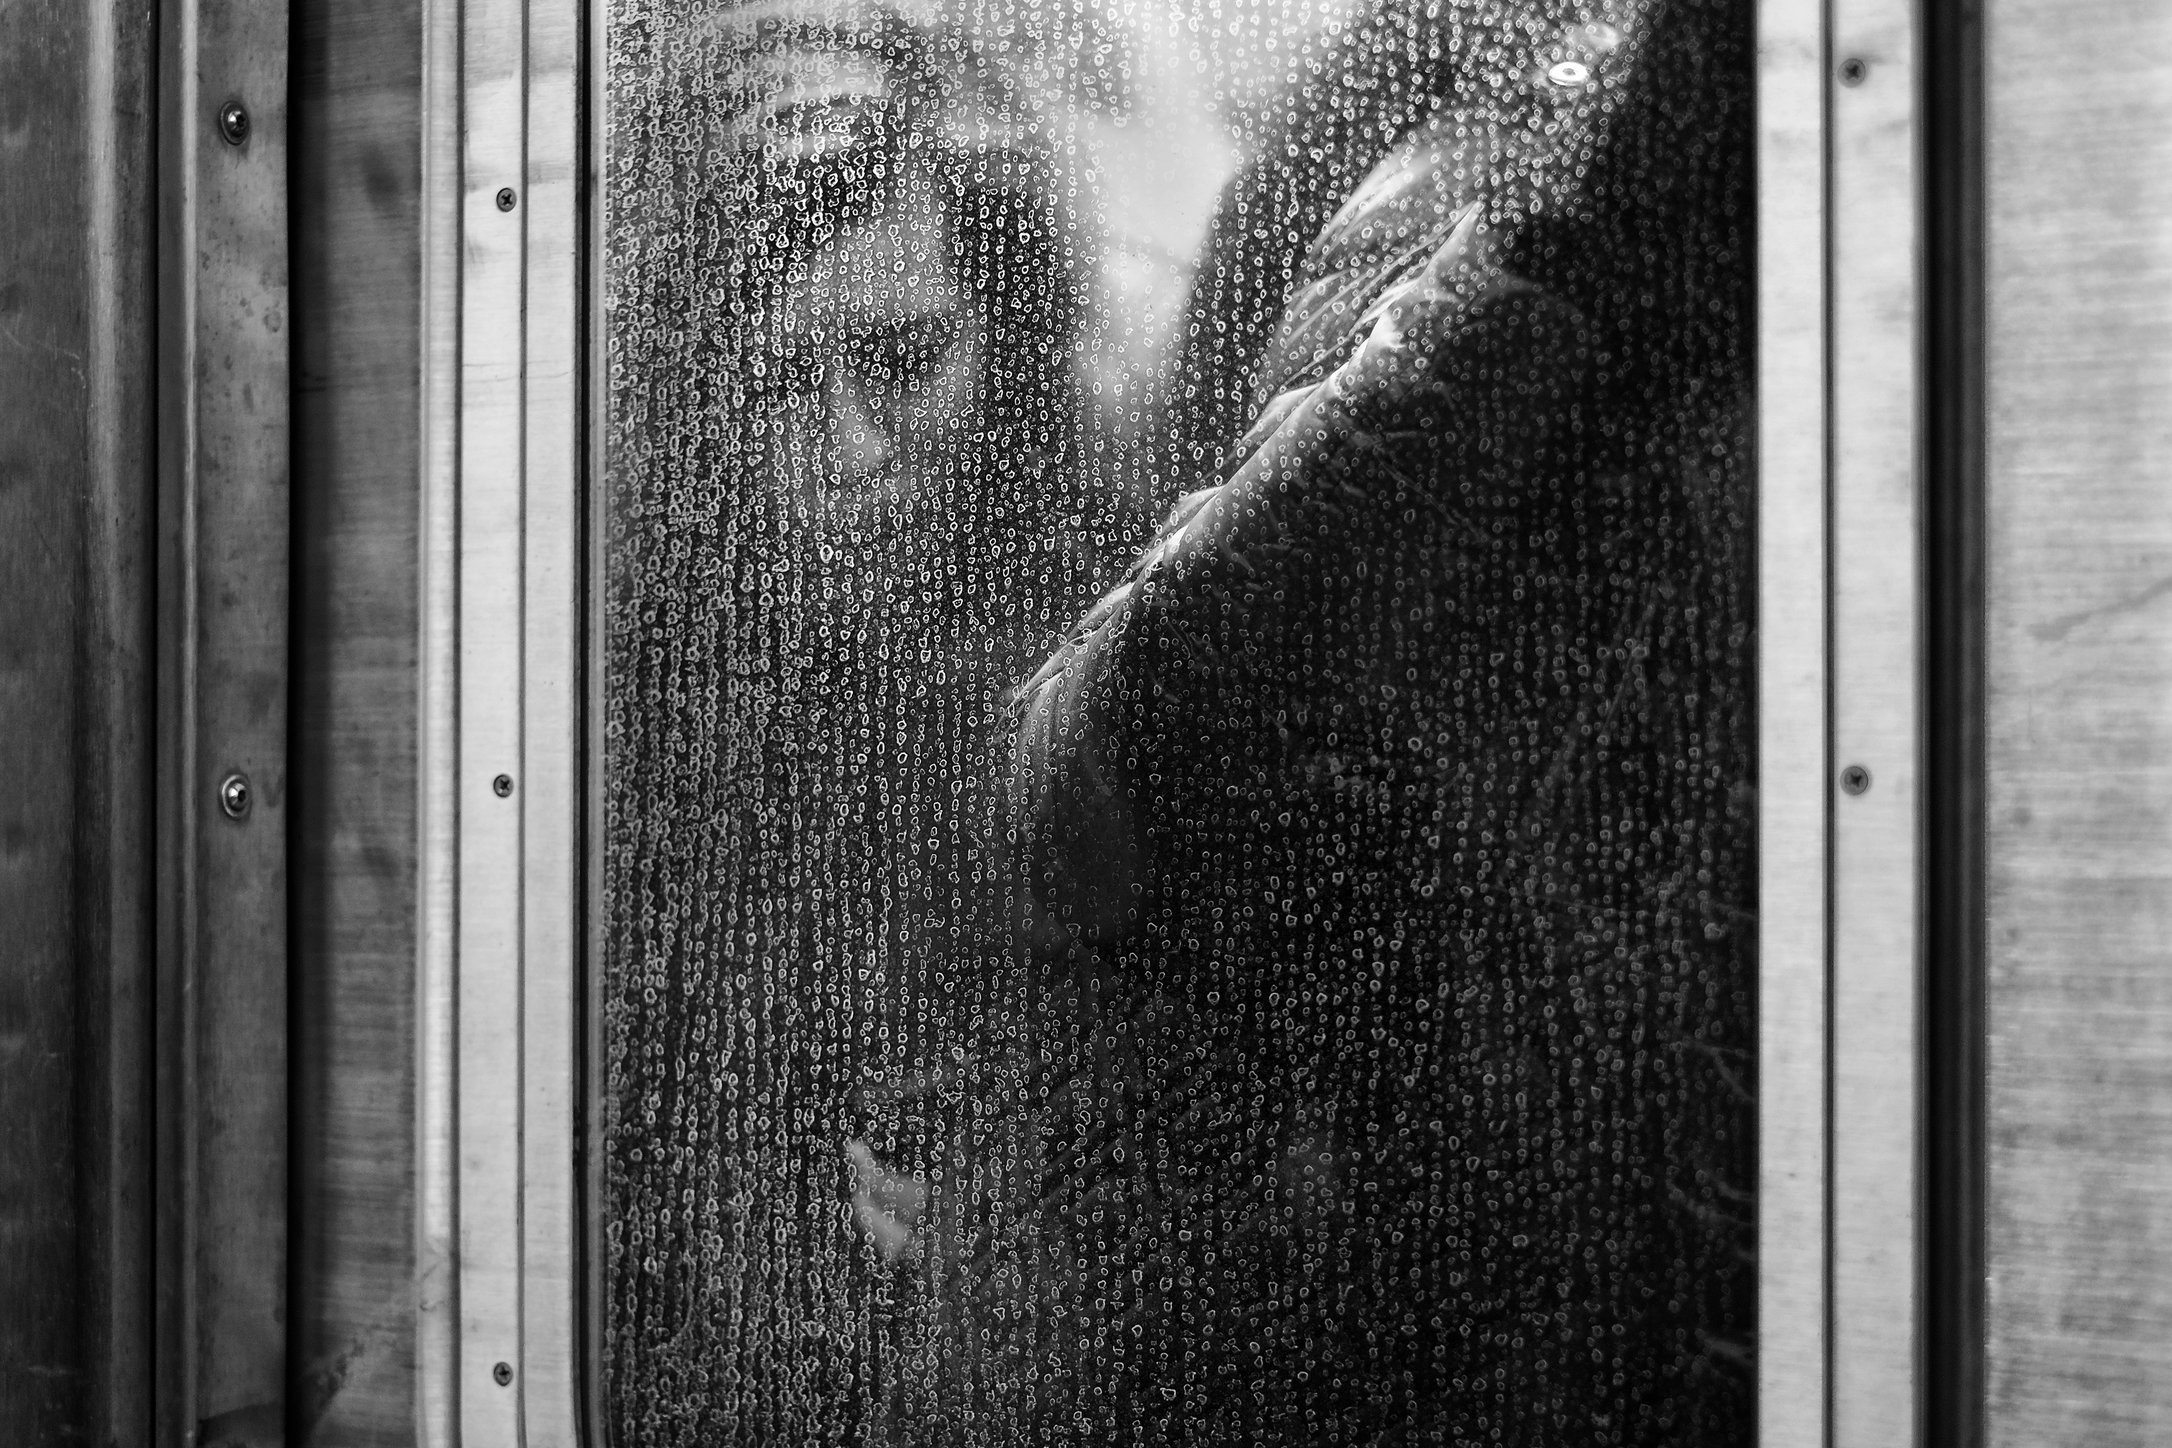 subway-window.jpg